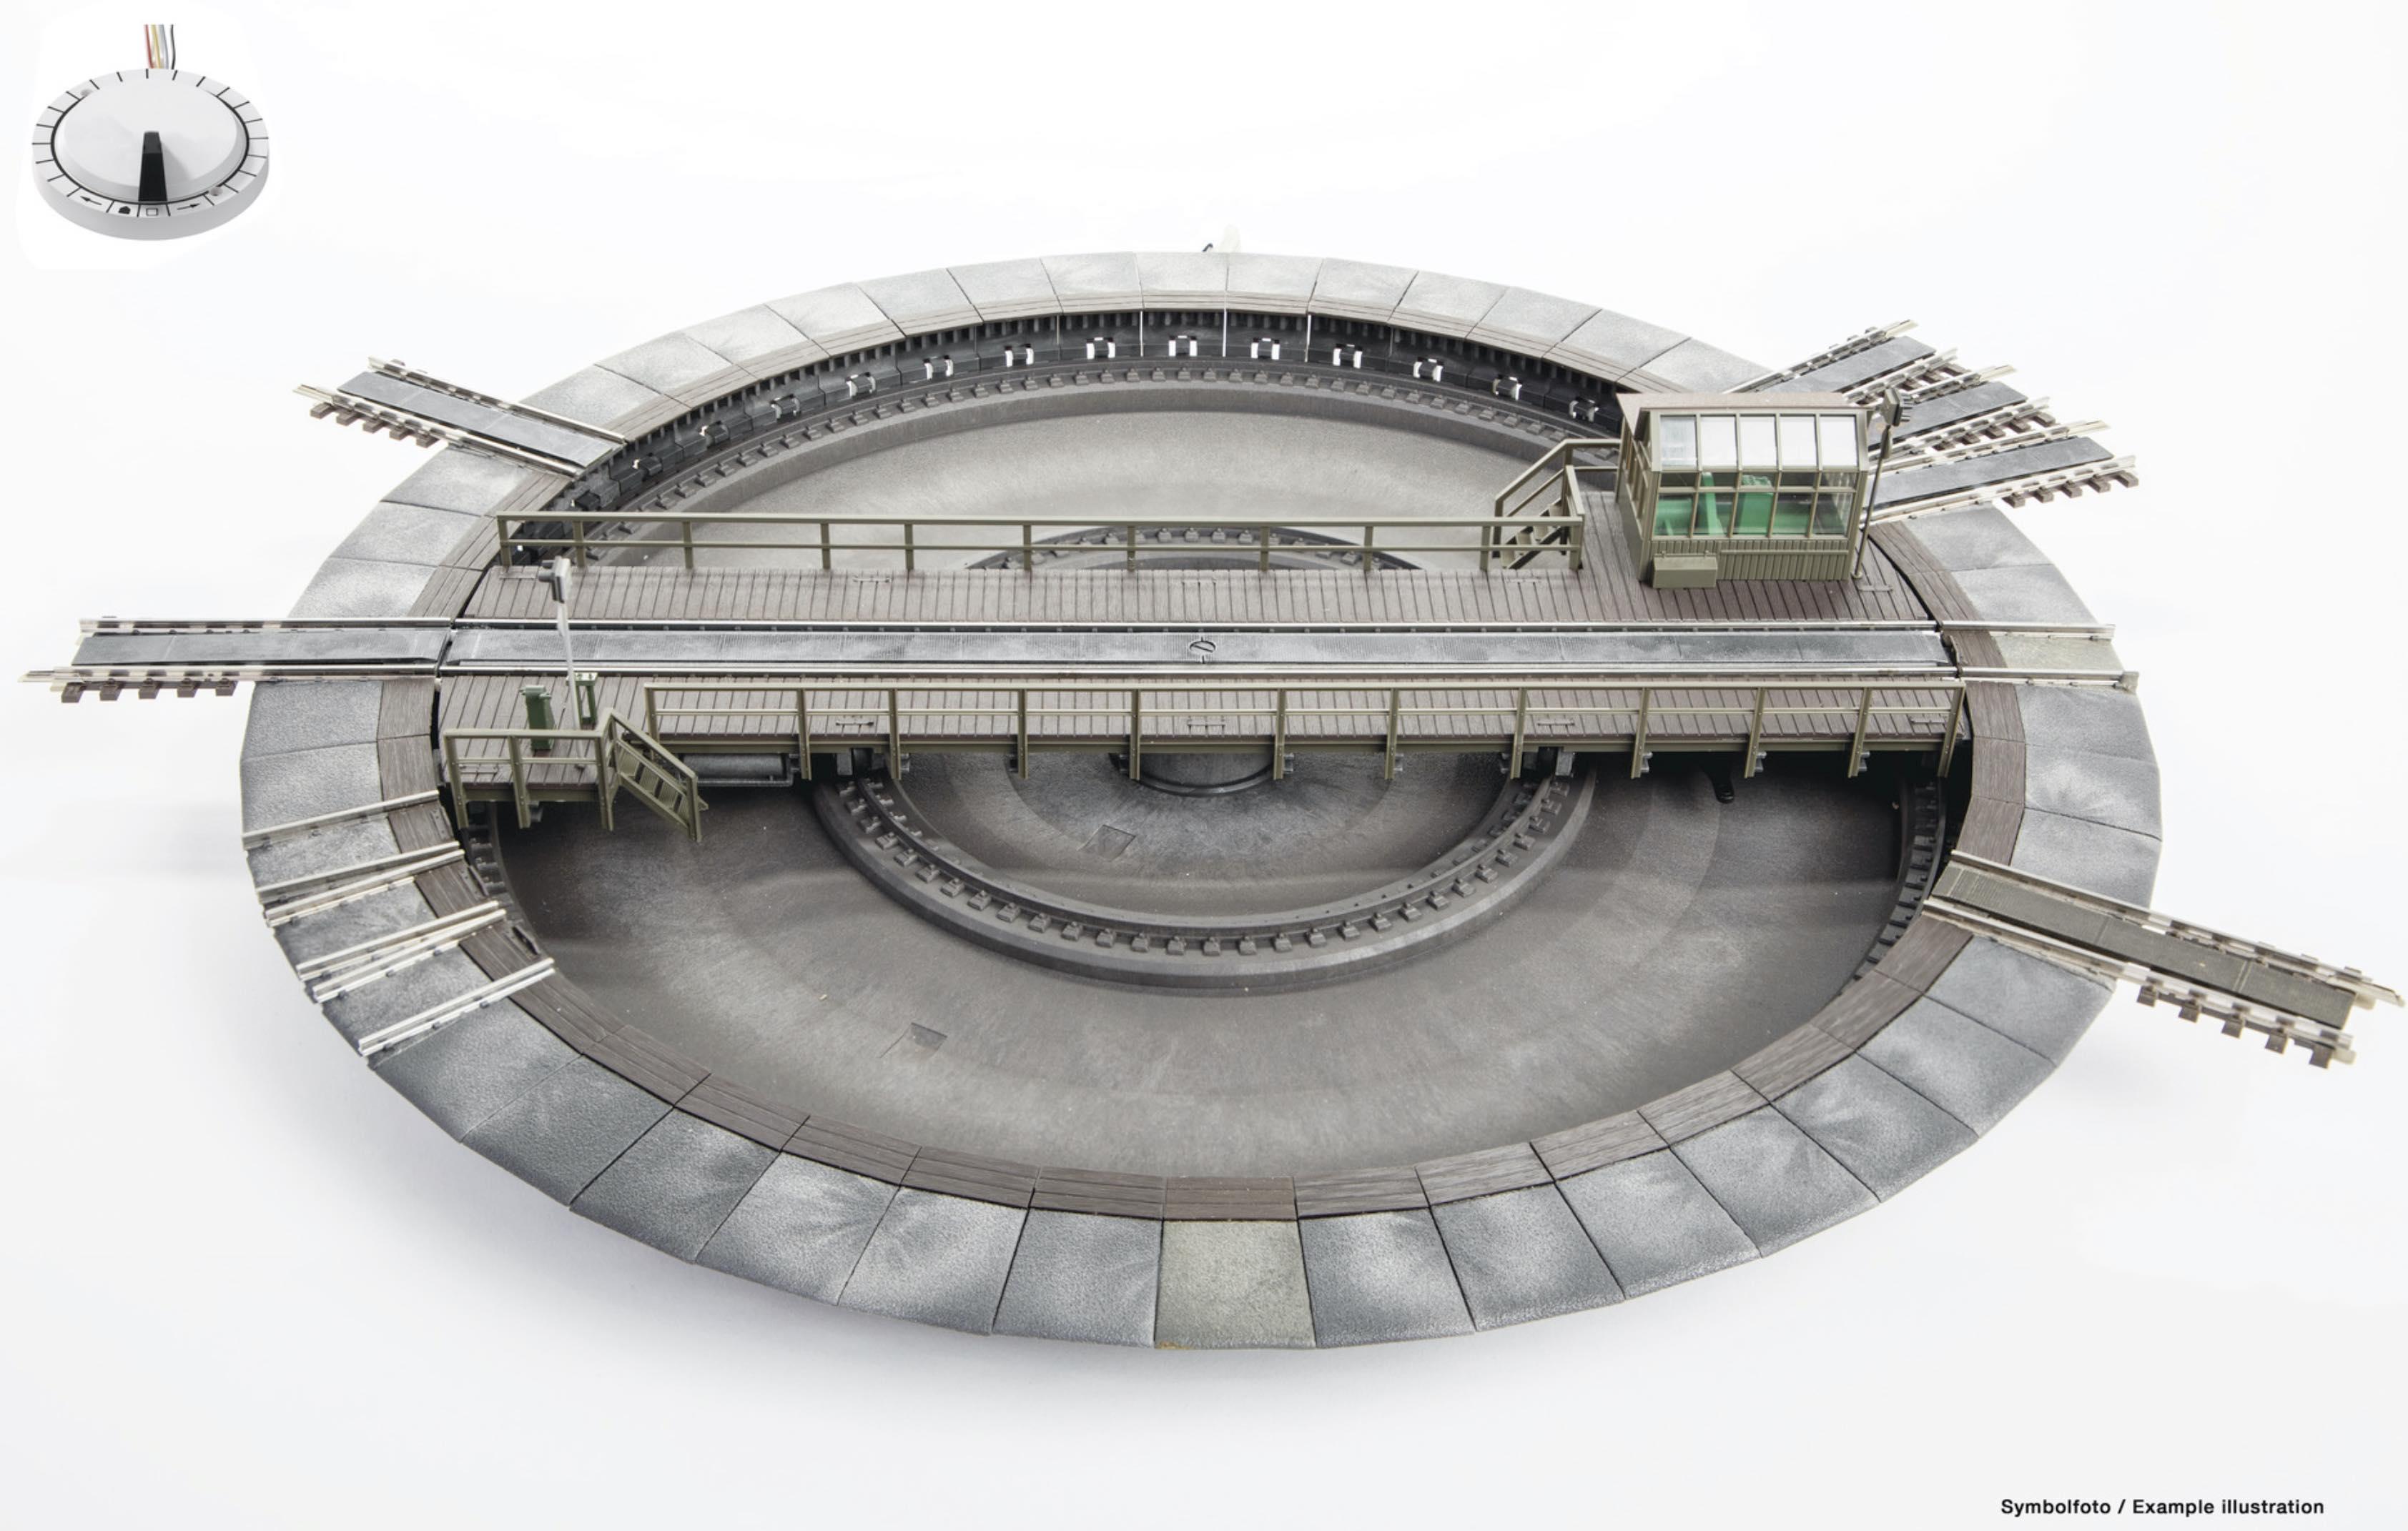 New production run of the Fleischmann HO turntable for Marklin